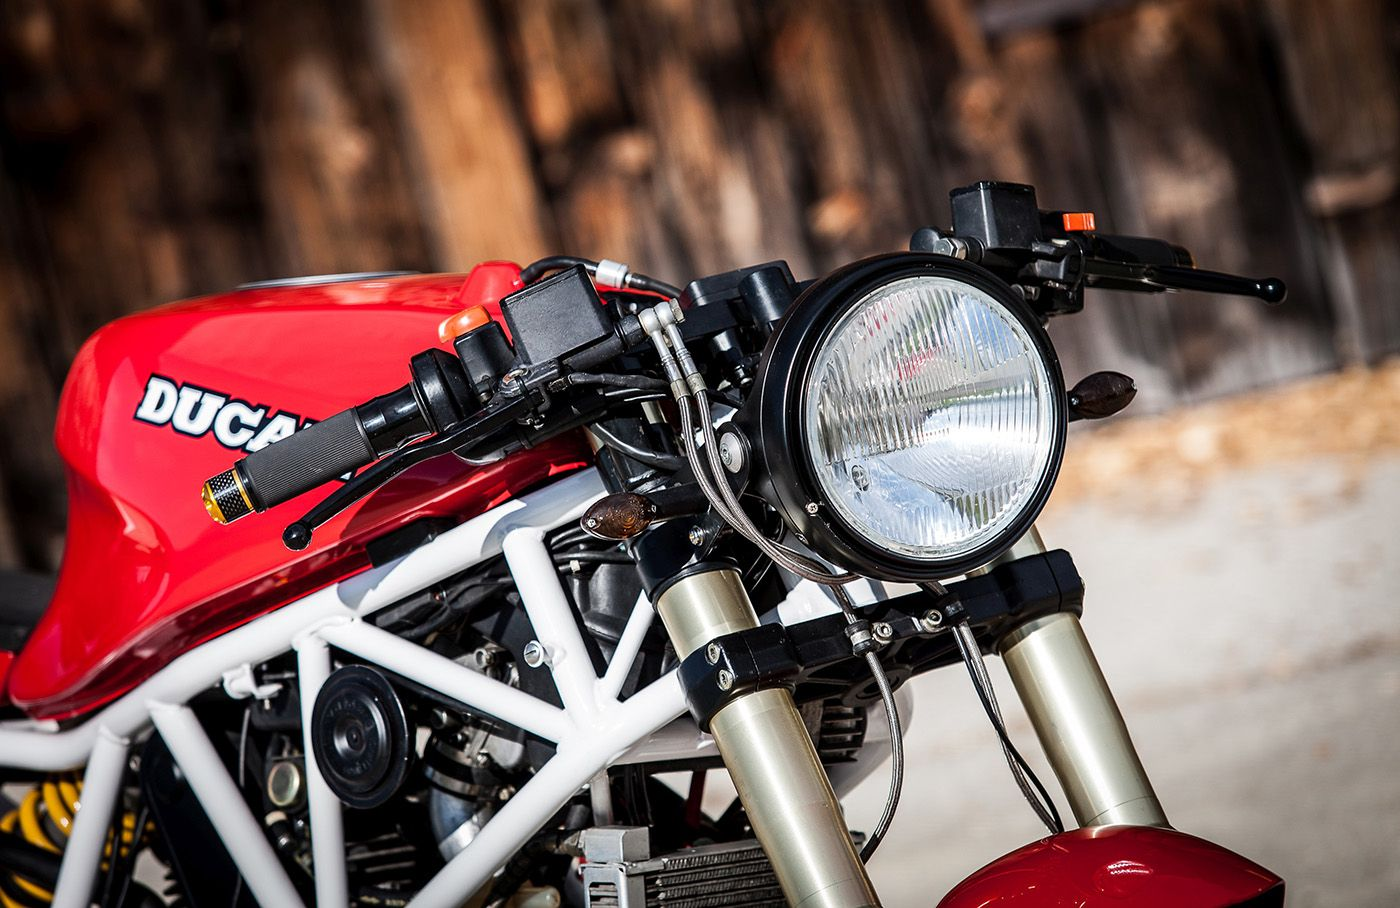 Polas Duc 750ss 4 Ducati Cafe Racer Bike Shed Bike